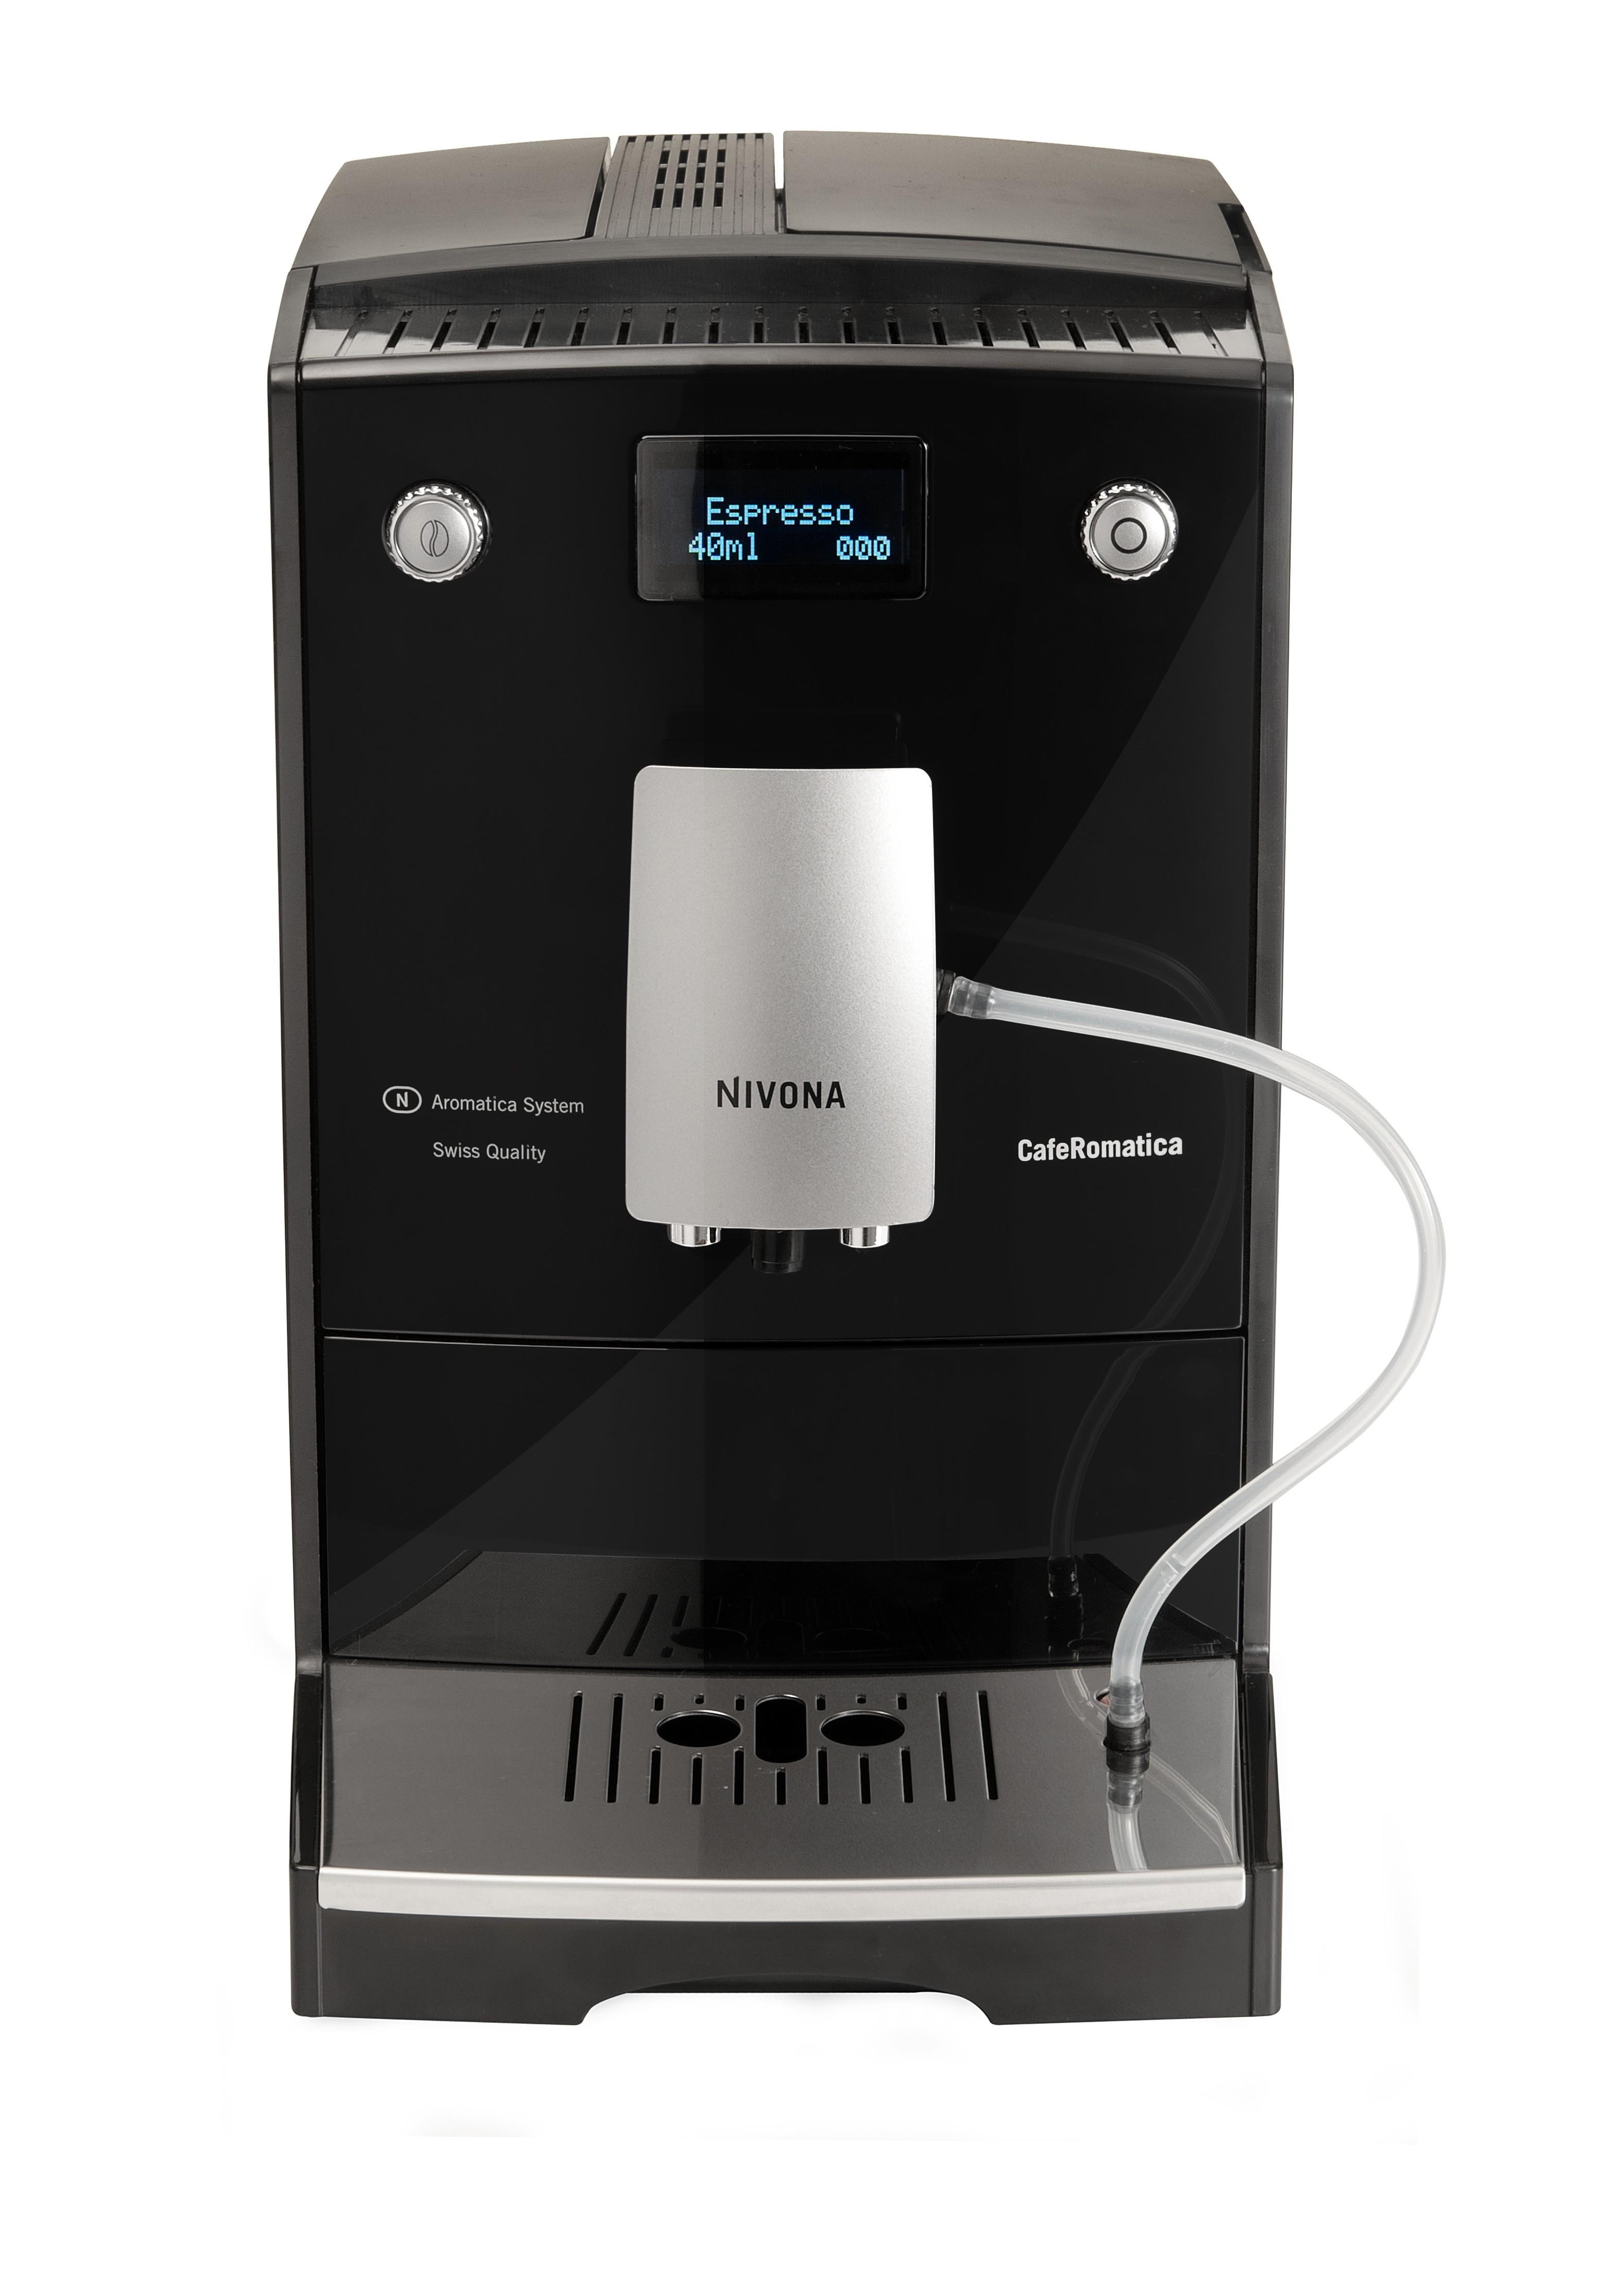 nivona nicr757 caferomatica kaffeevollautomat macht. Black Bedroom Furniture Sets. Home Design Ideas